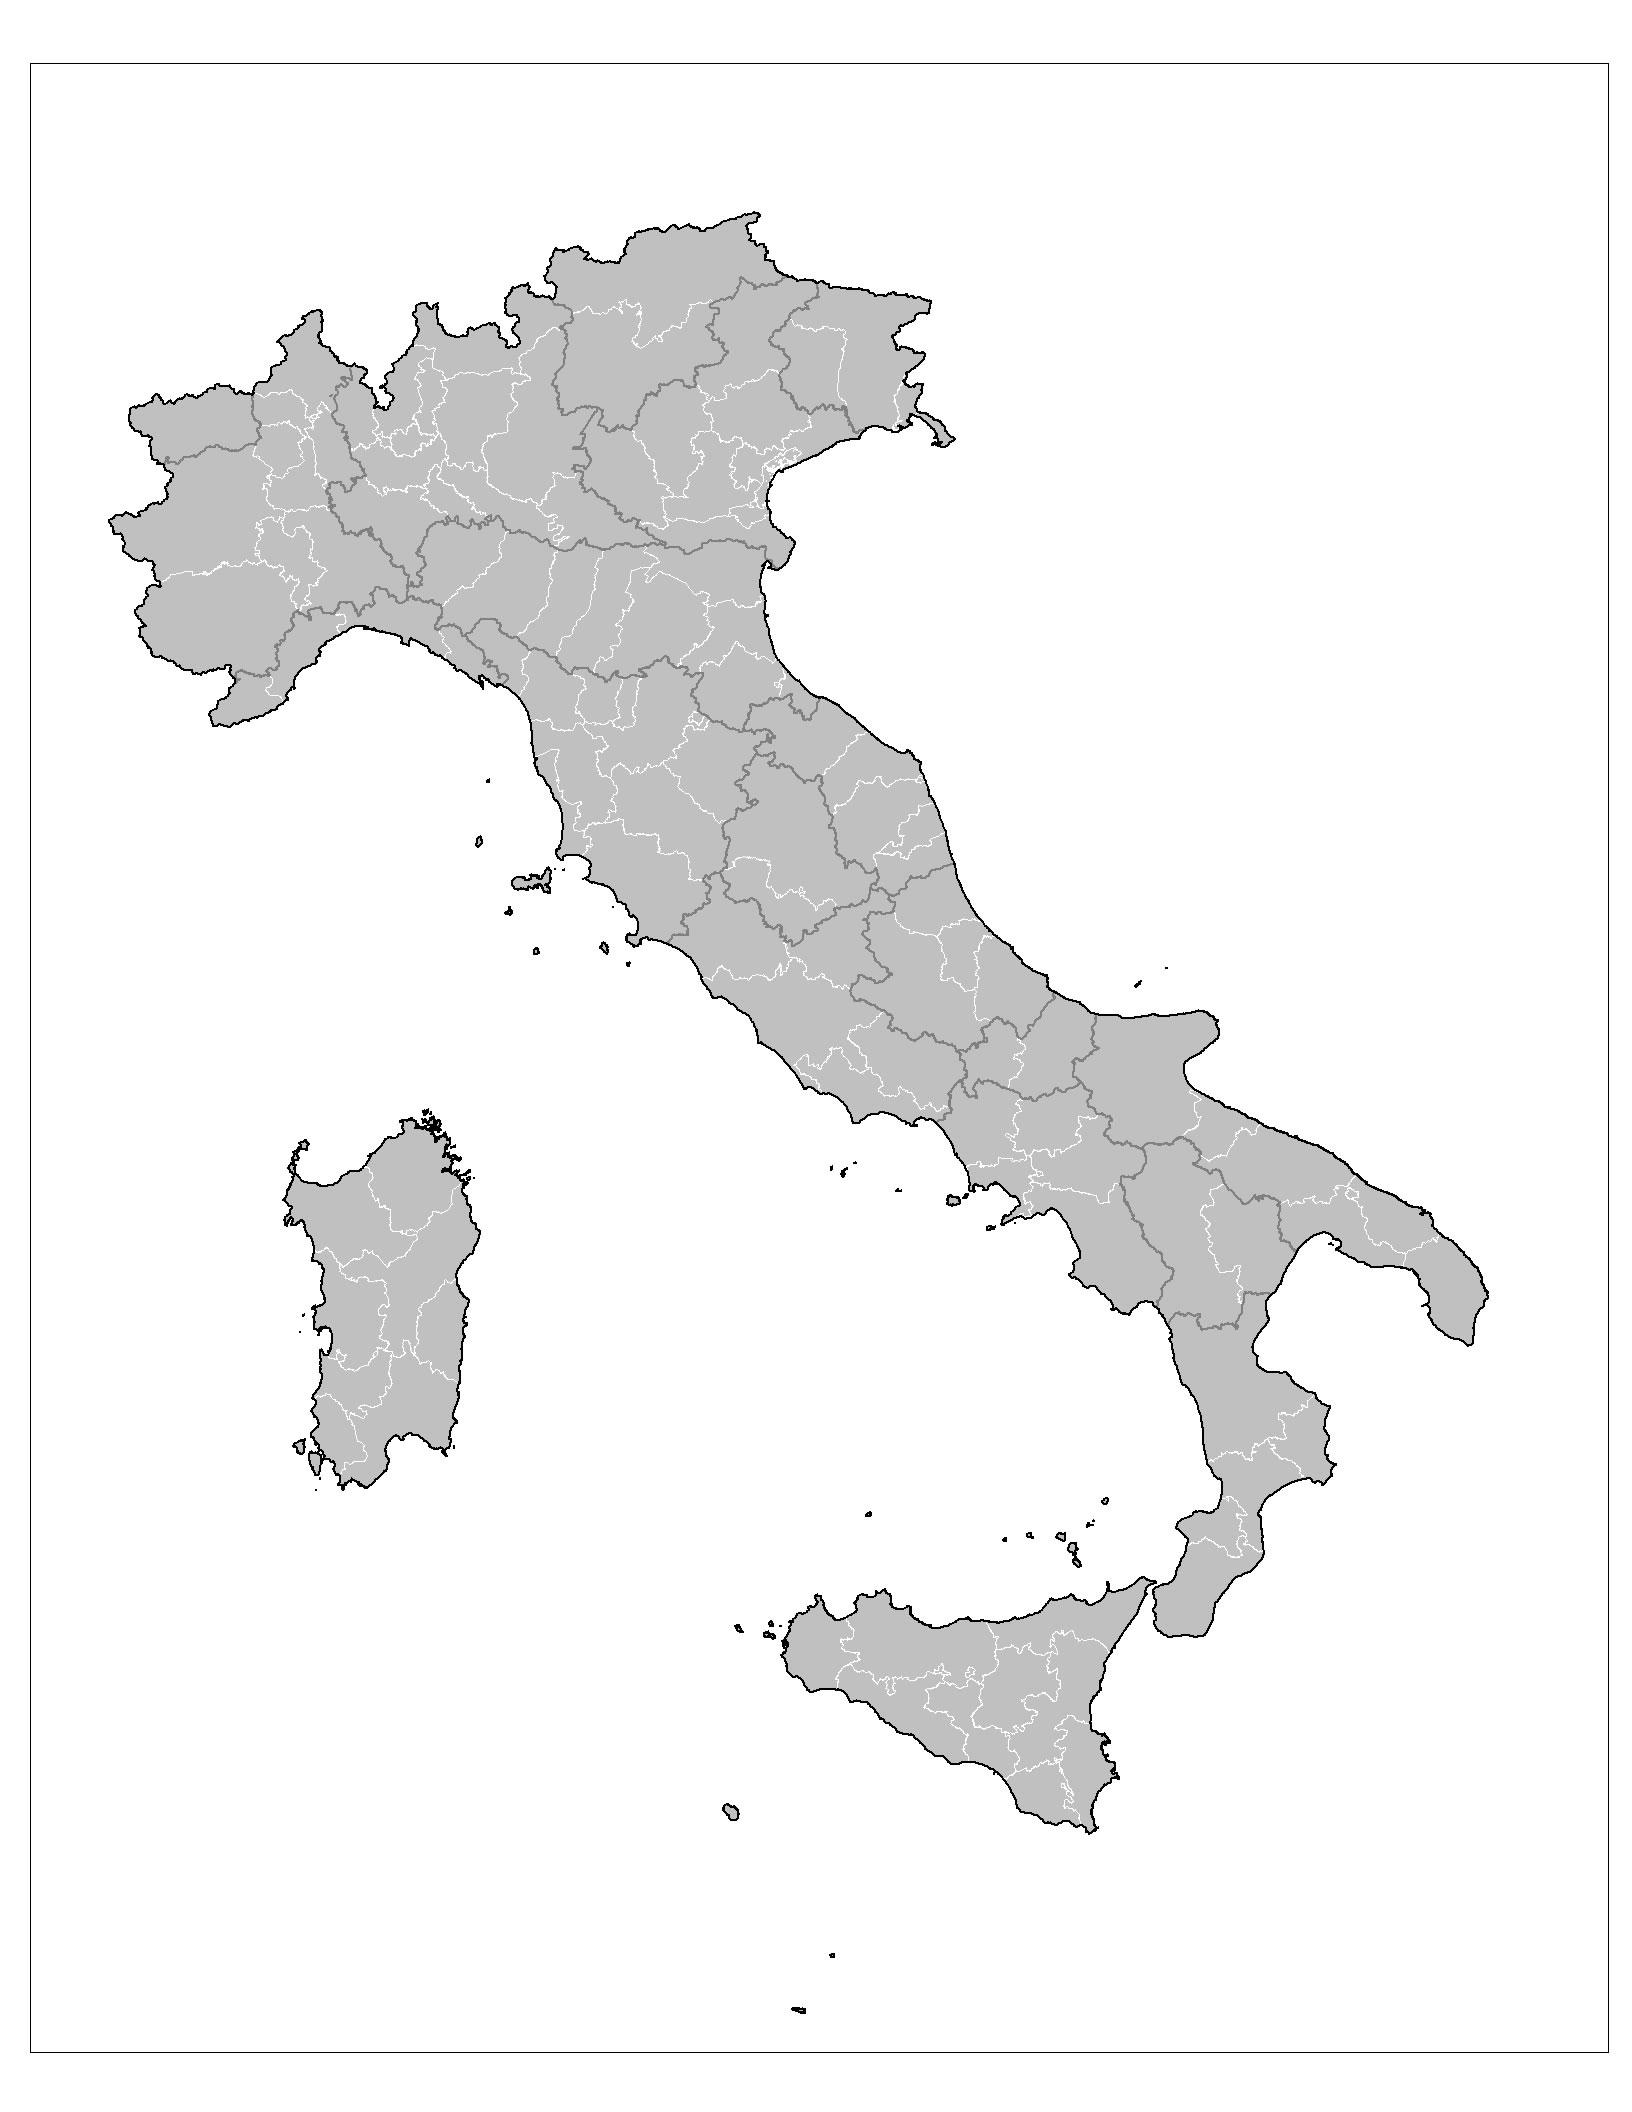 Carte Italie Vierge Numéros Régions, Carte Vierge Des encequiconcerne Carte Des Régions Vierge